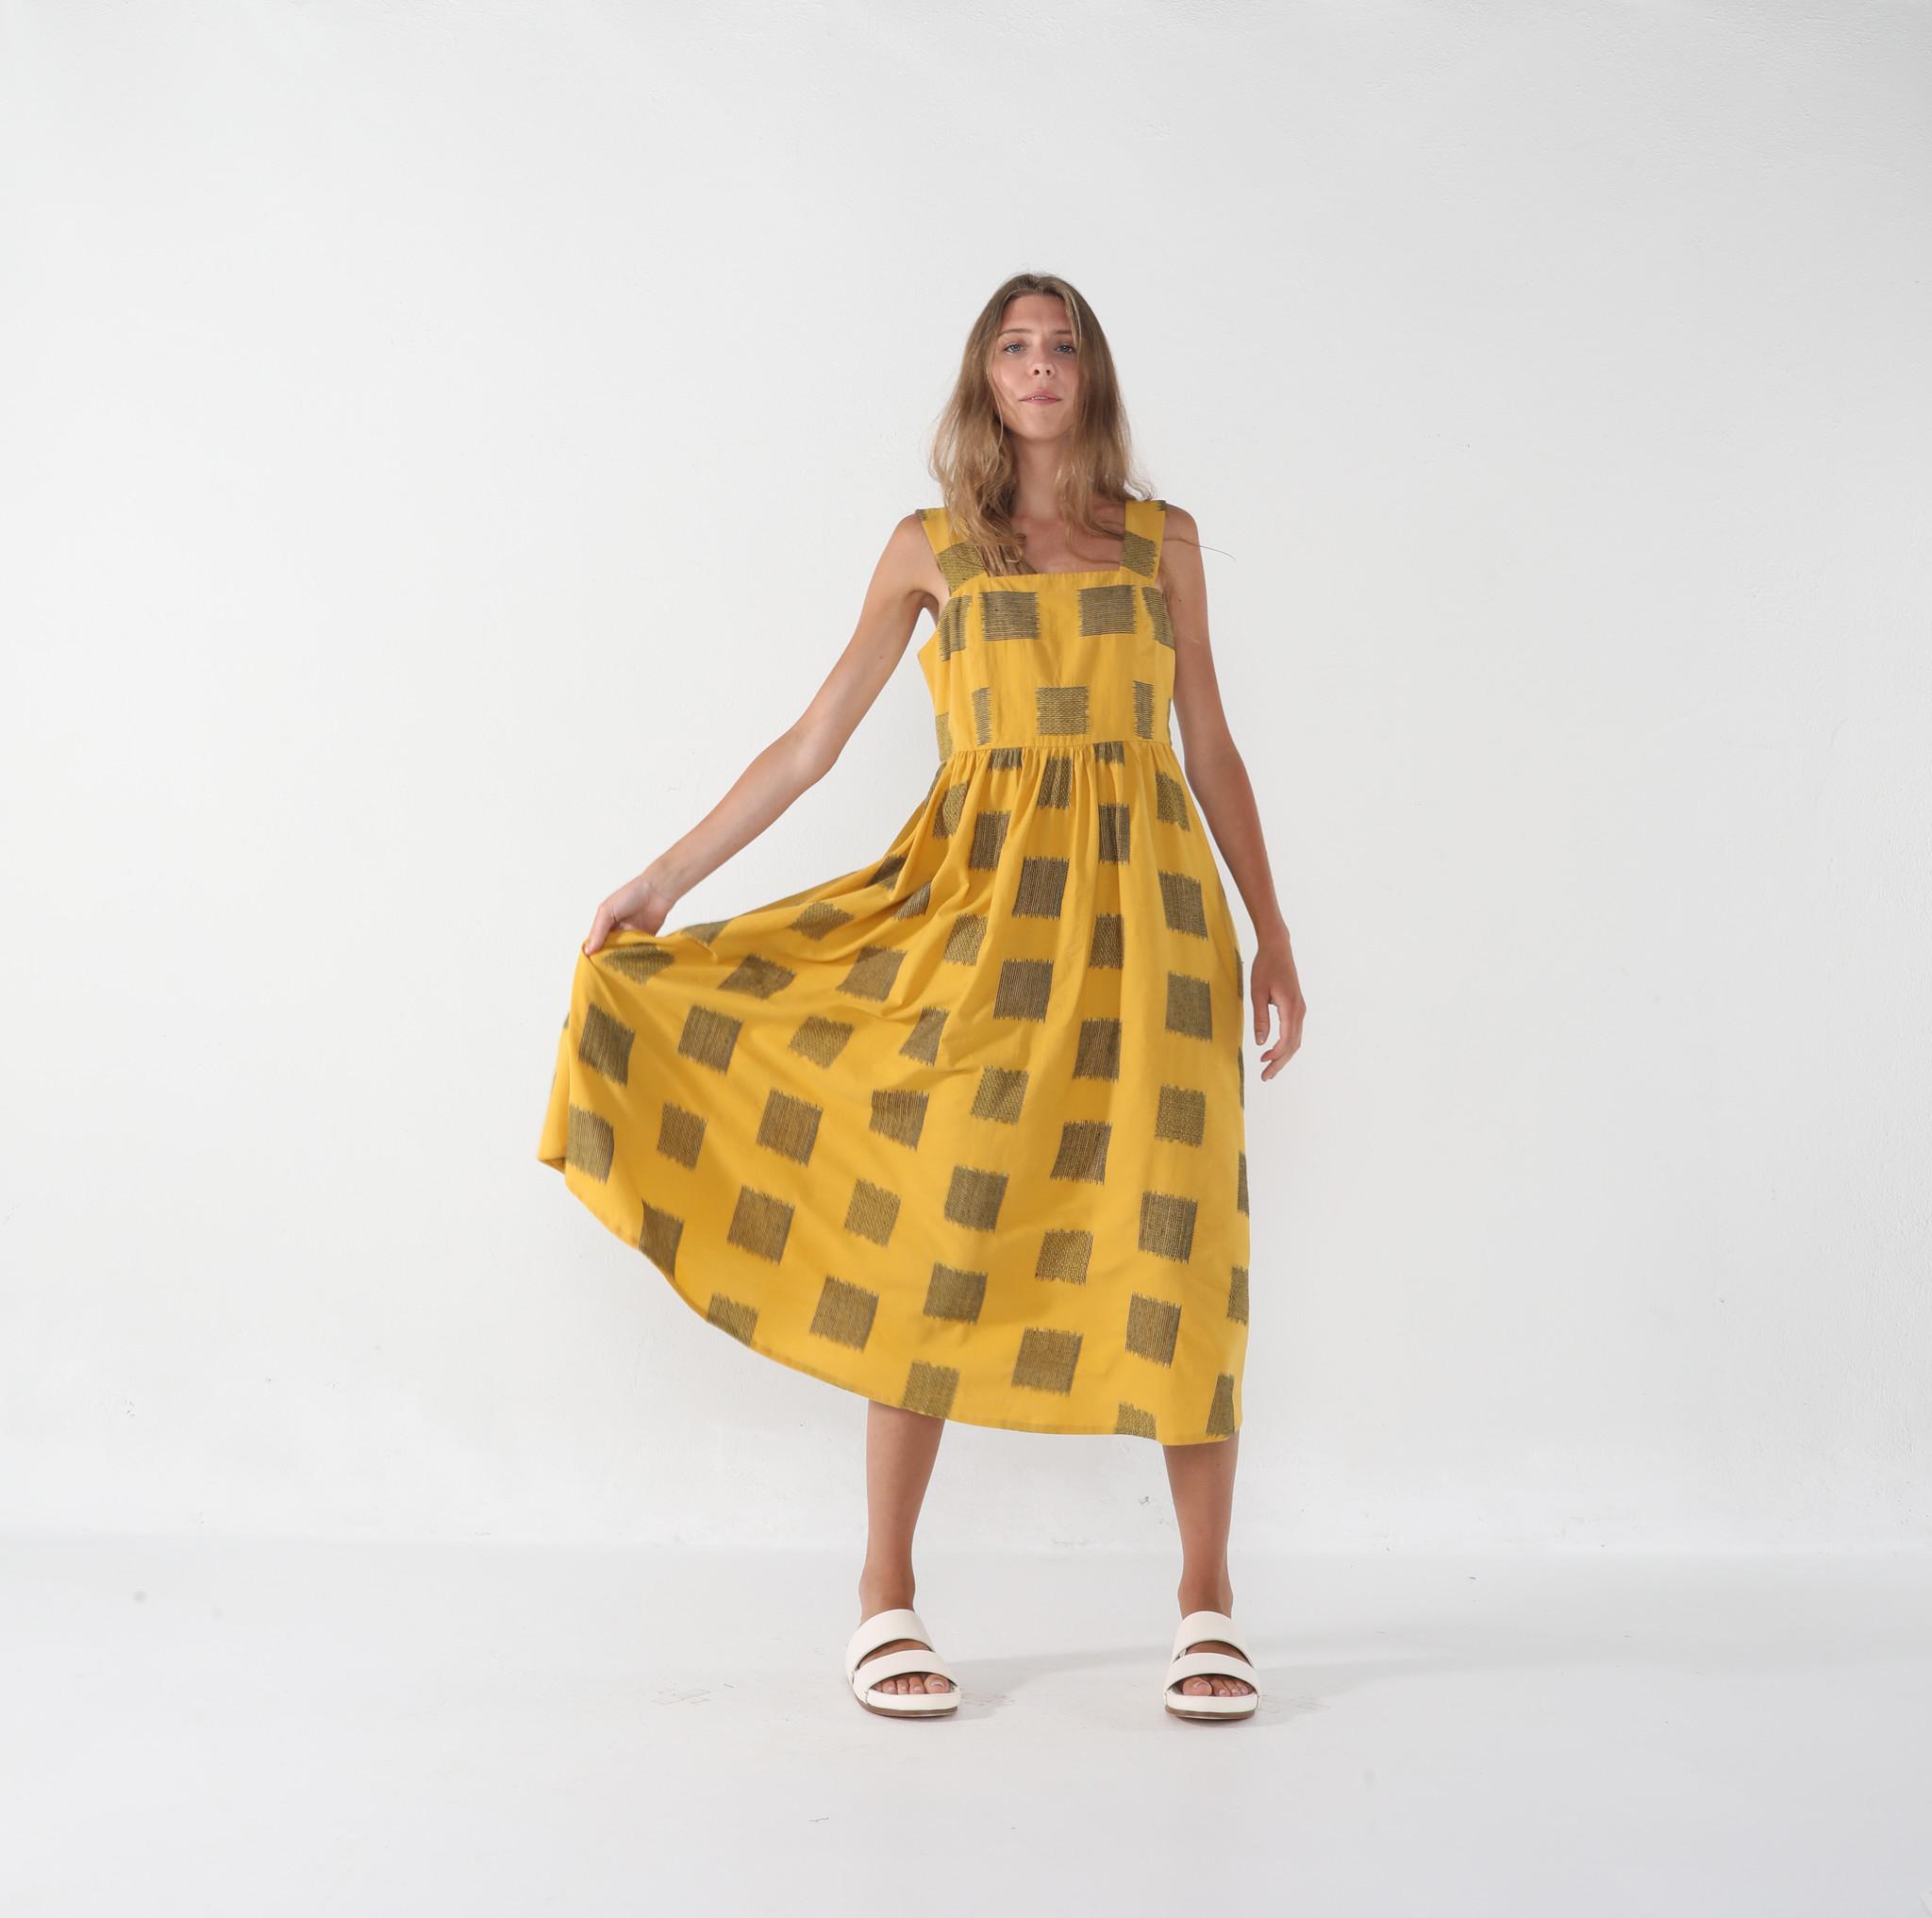 7115 by SZEKI Summer Sundress, Canary Square Print